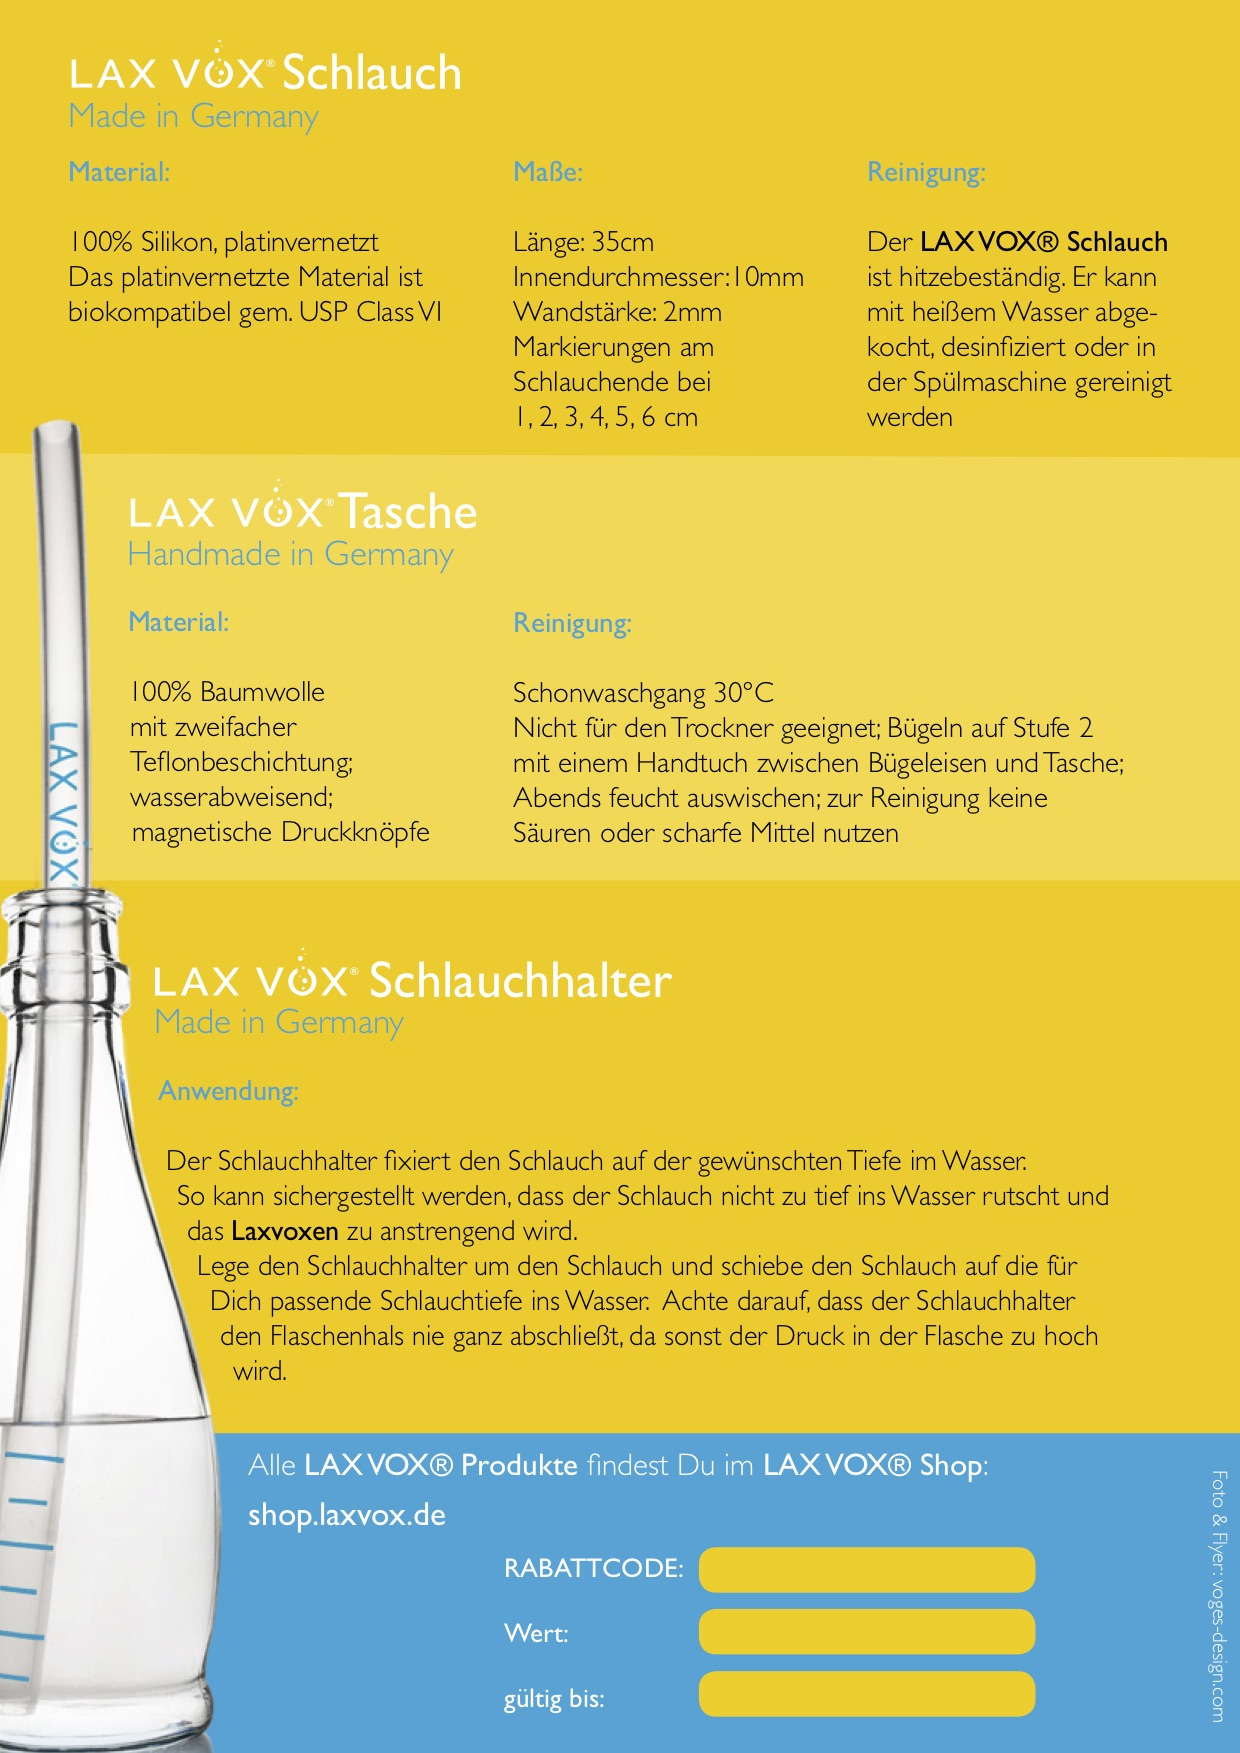 LAX VOX® - explained by Stephanie A. Kruse